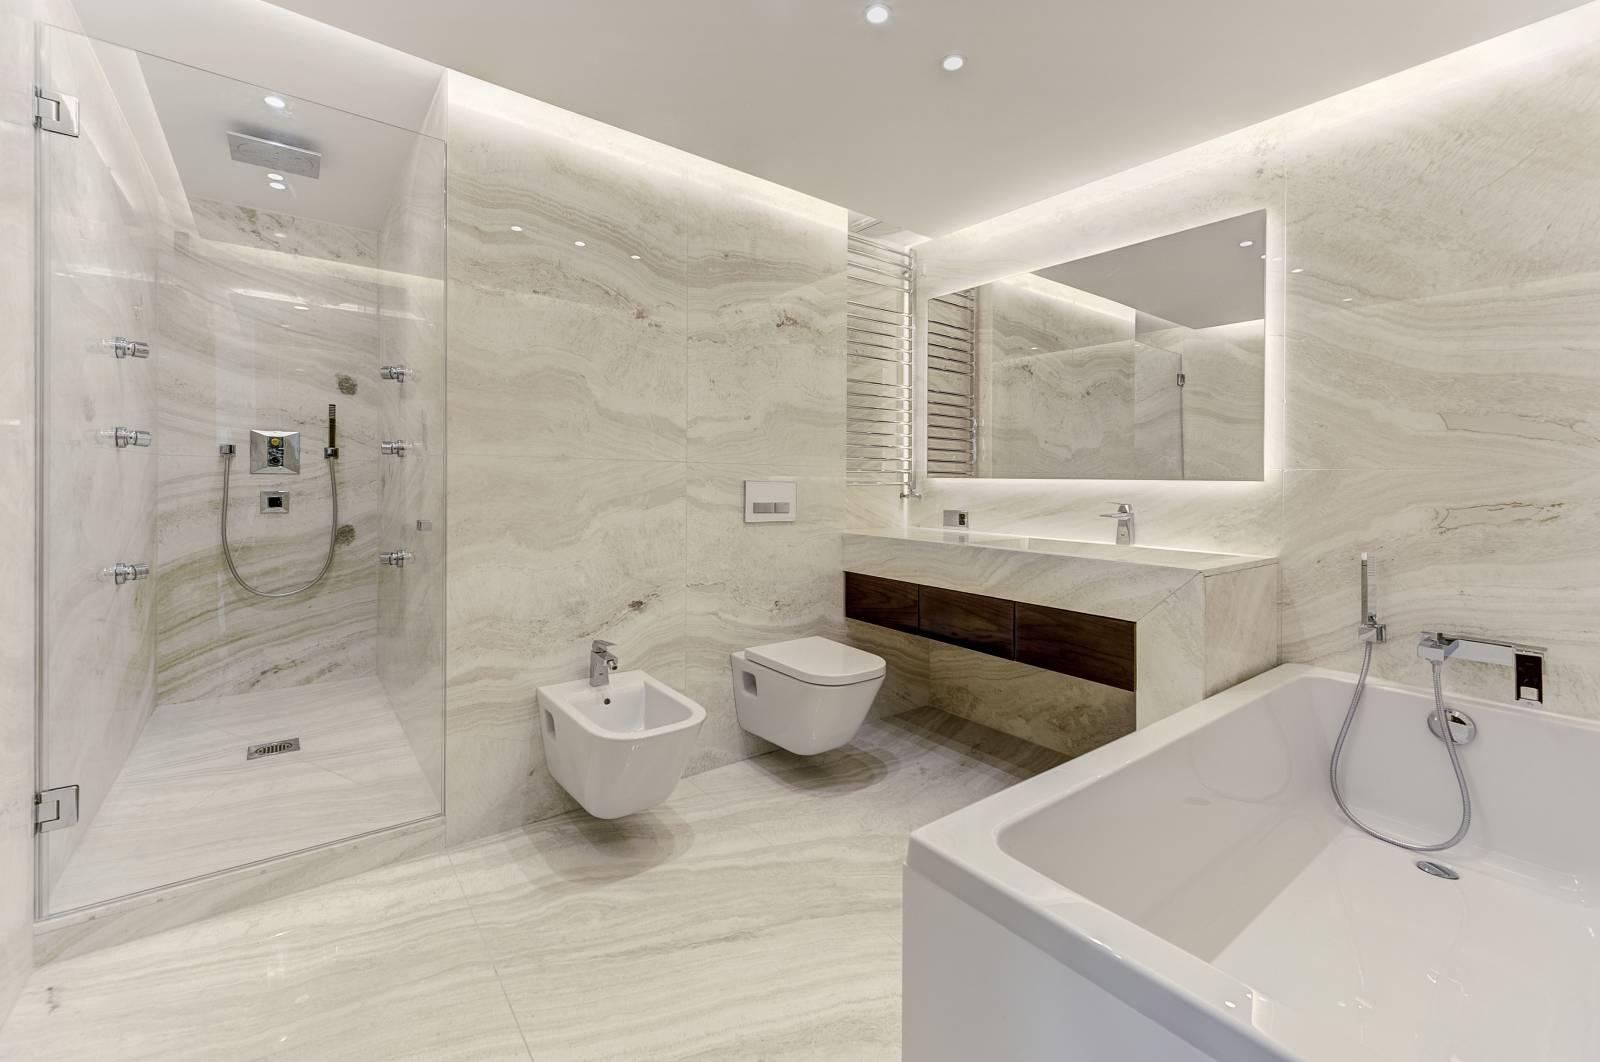 TRAVERTIN ASCOLANO - Pierre naturelle, marbre, granit ...